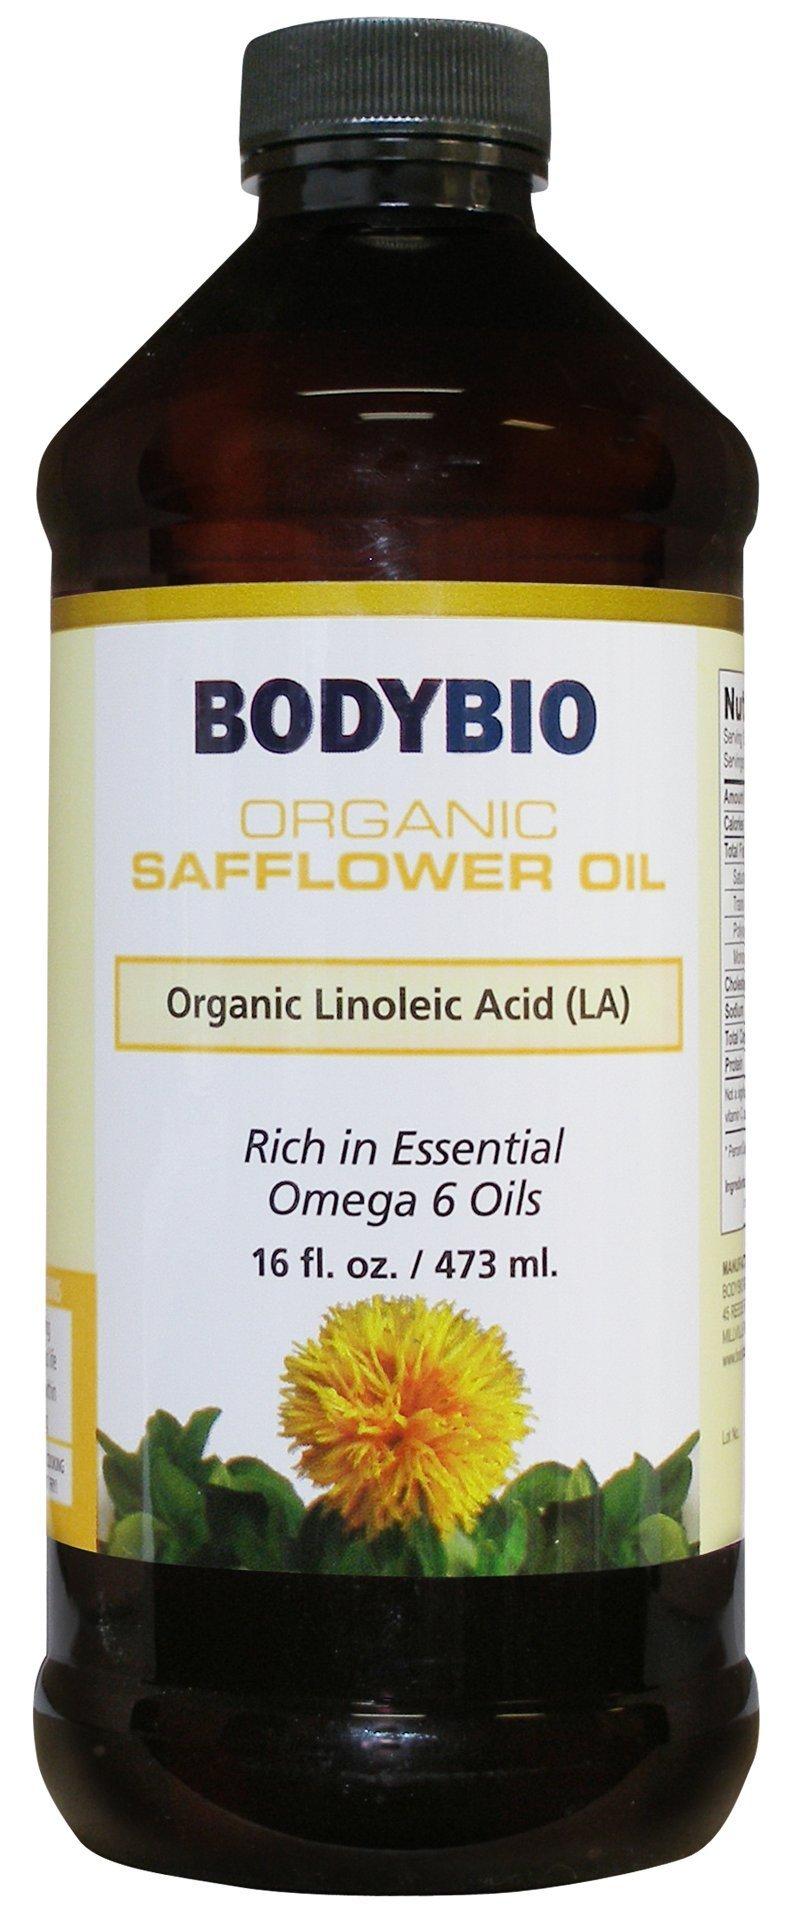 BodyBio - Organic Safflower Seed Oil, Unrefined, Cold Pressed, High Linoleic Acid, 16oz by BodyBio